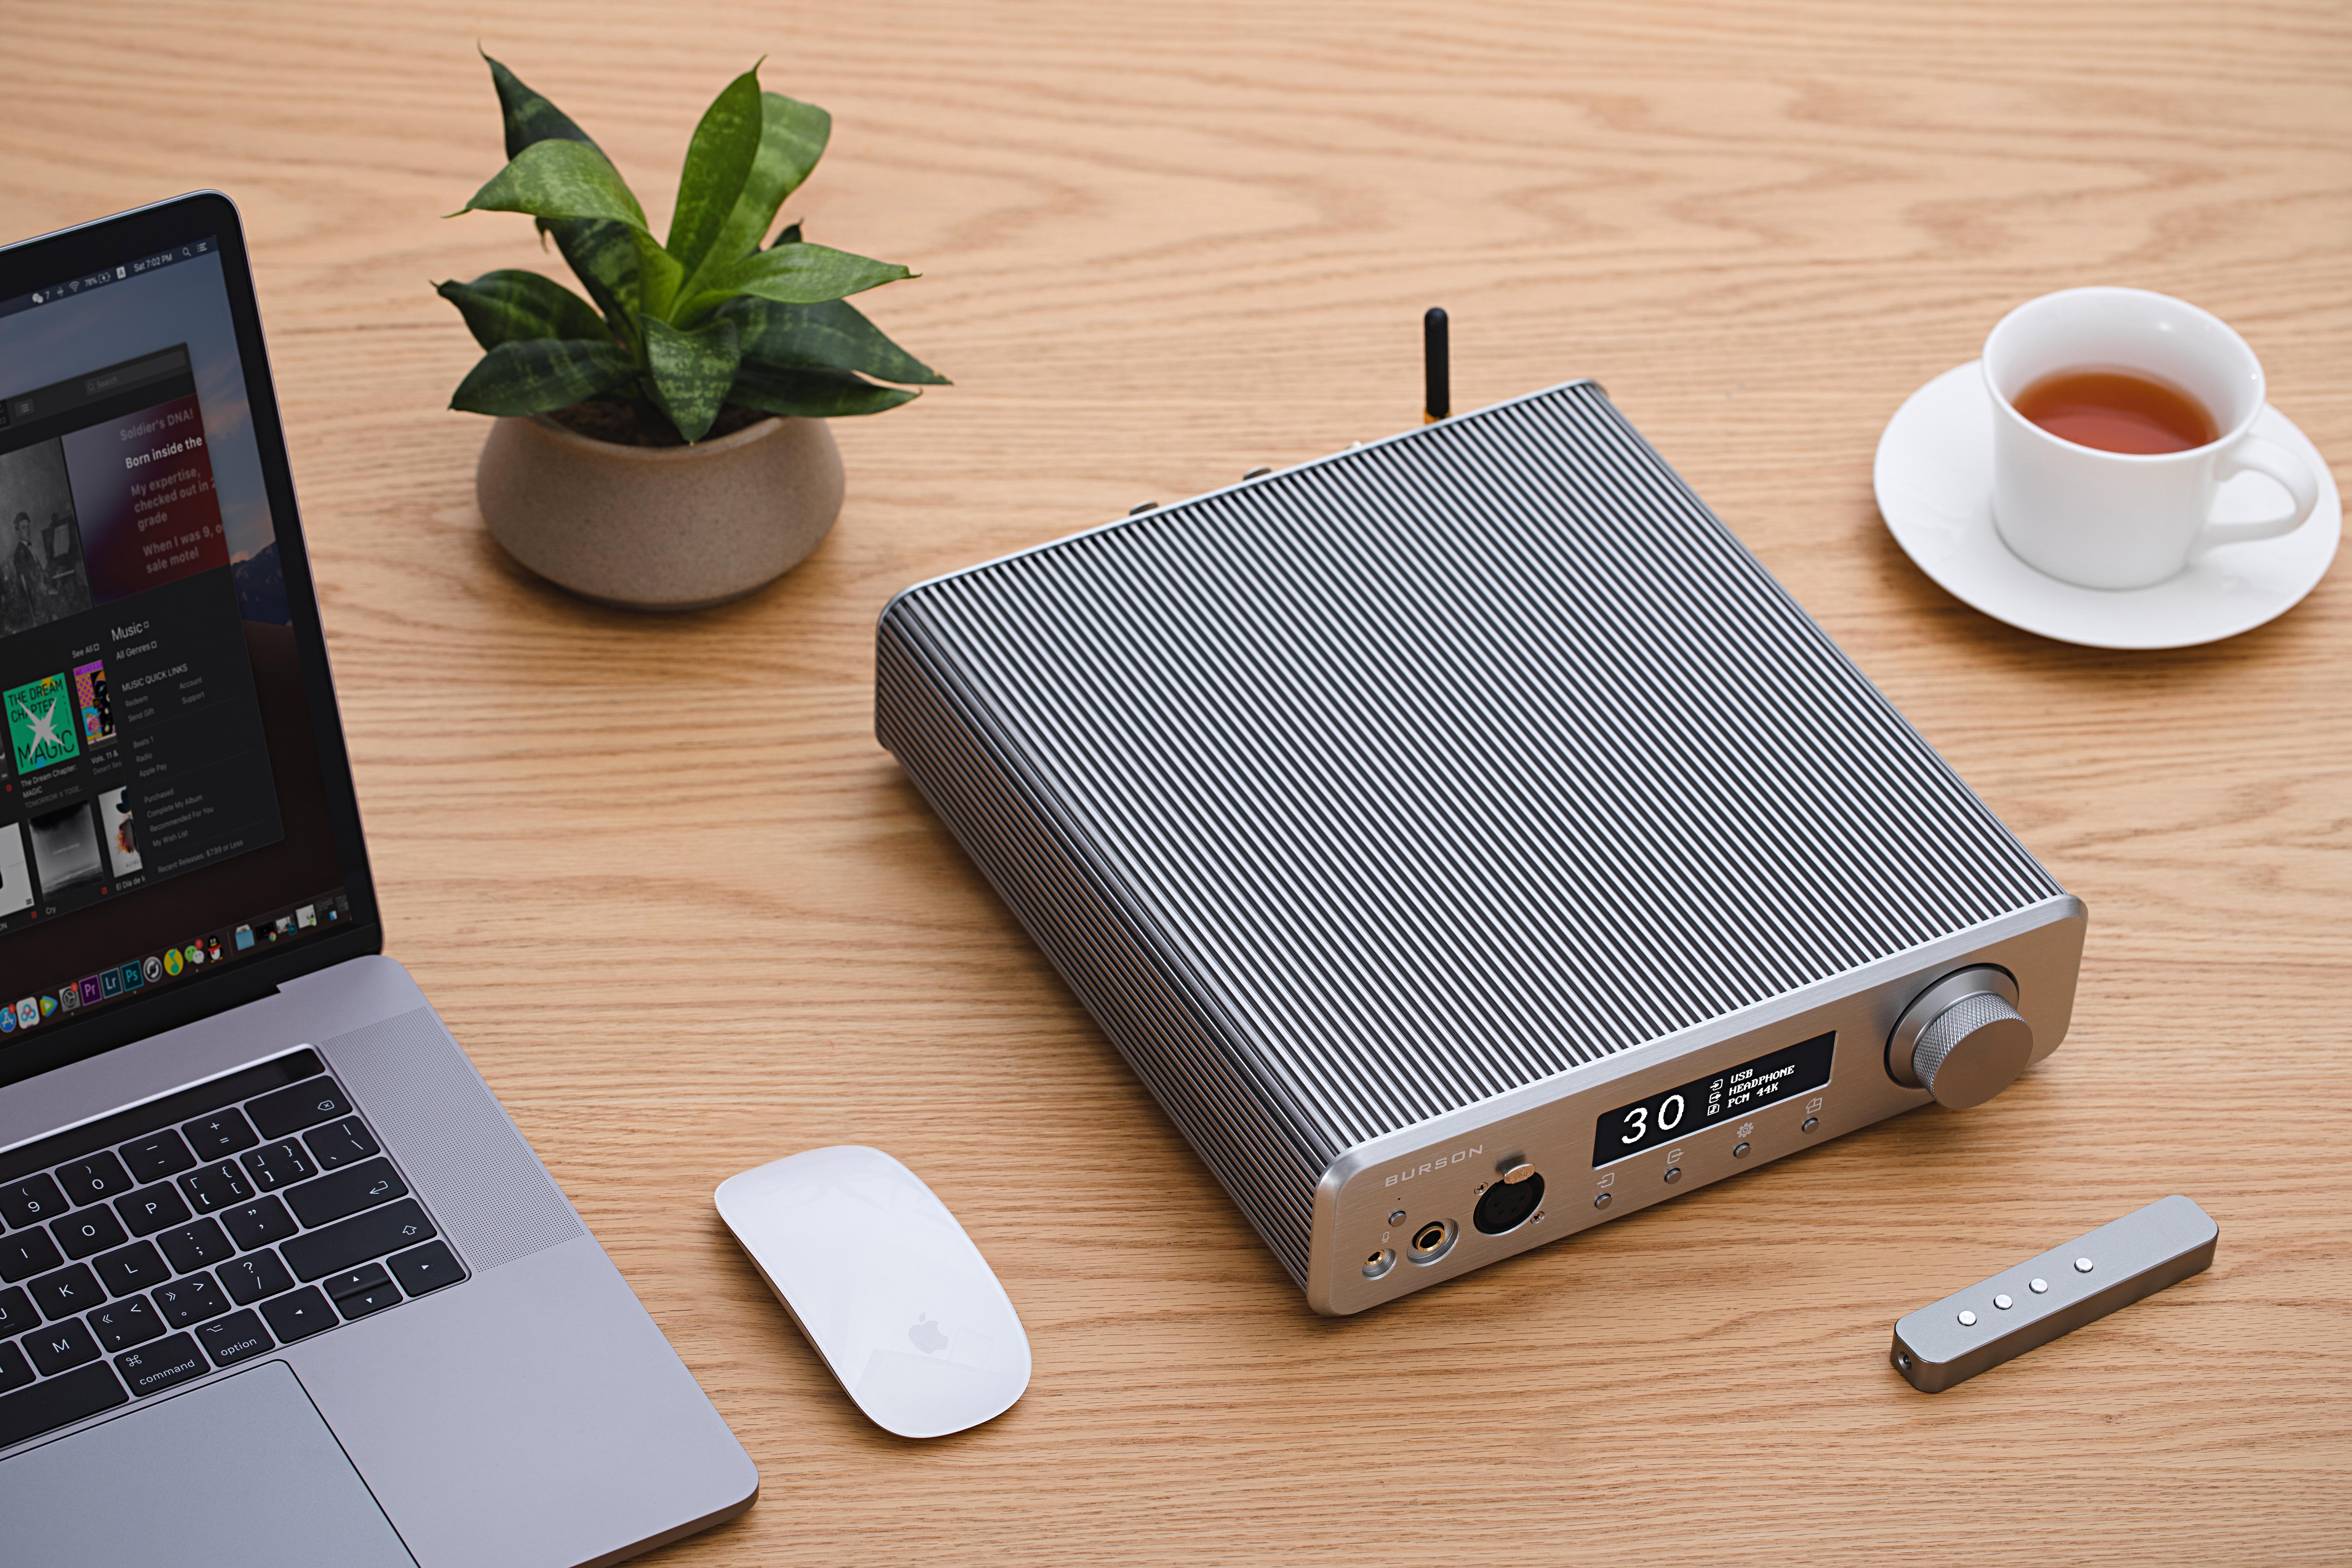 burson-audio-conductor-3x-reference-lifestyle4-headamp-preamp-dac.jpg